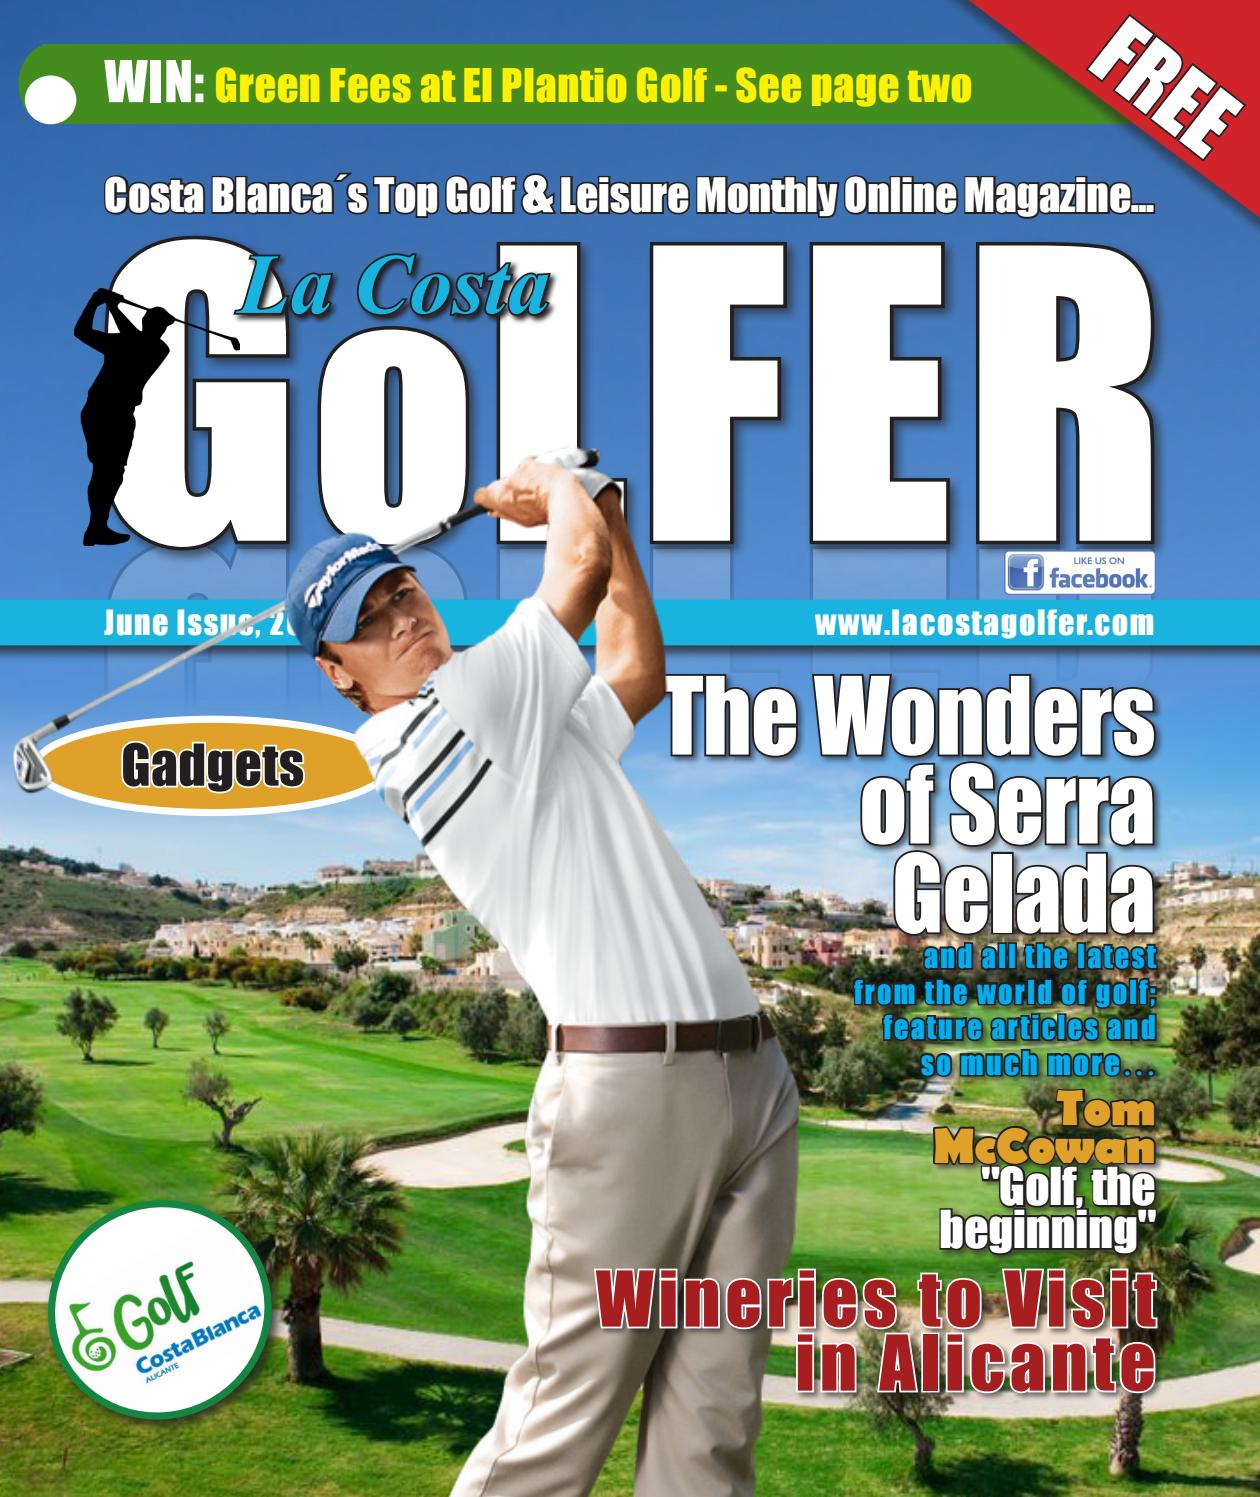 71d42365 La Costa Golfer Online Magazine June Issue 2018 by 4display - issuu